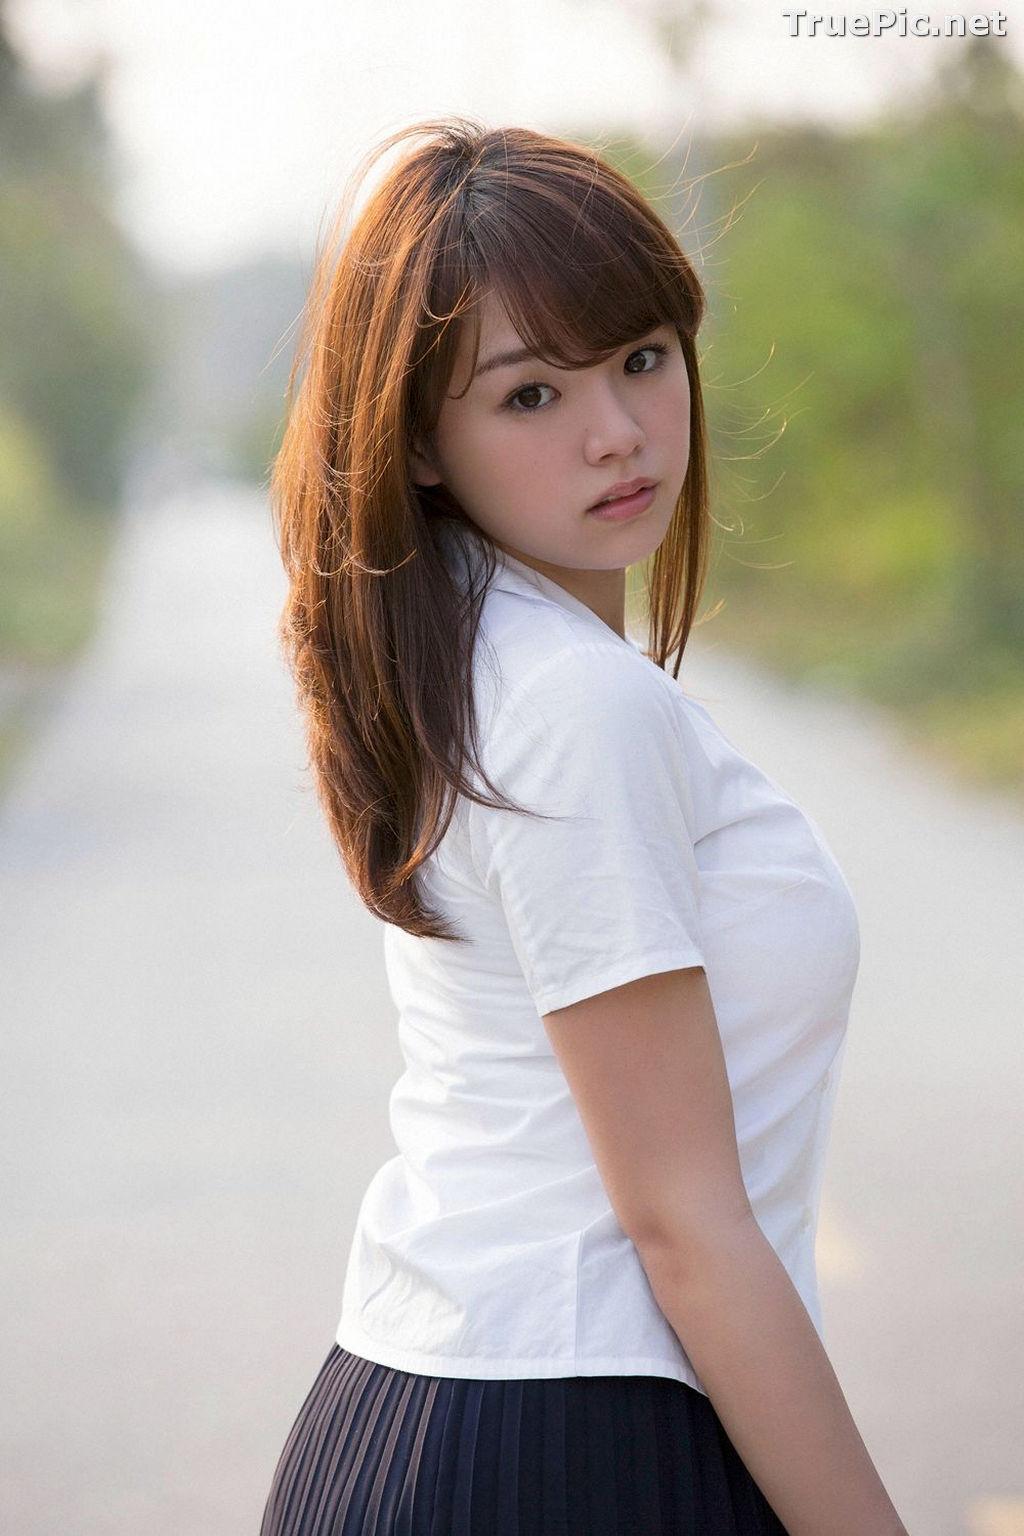 Image [YS Web] Vol.560 - Japanese Gravure Idol and Singer - Ai Shinozaki - TruePic.net - Picture-3